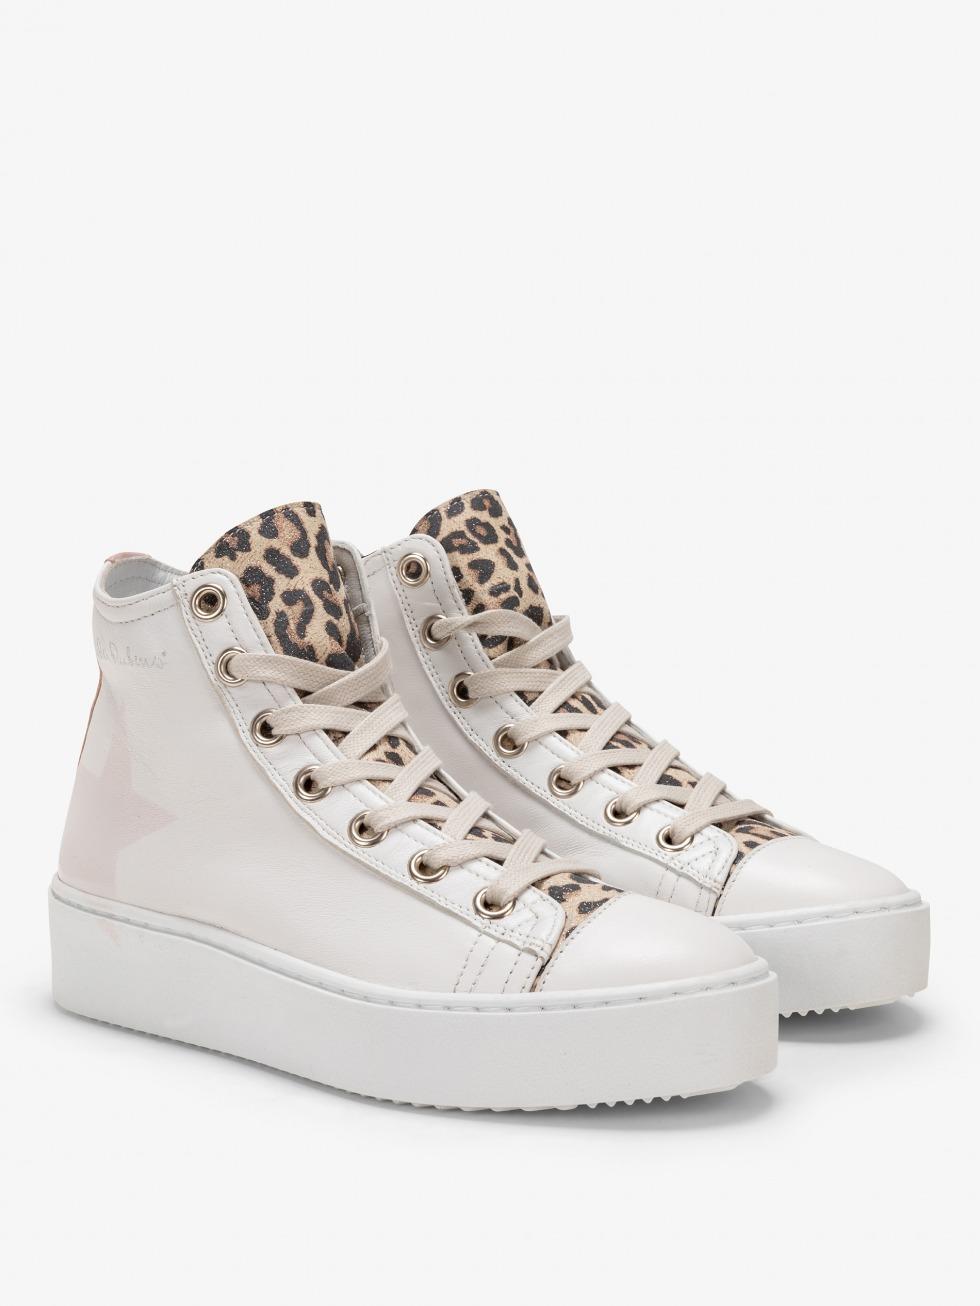 Sneakers Long Island Leo Pearl - Stella